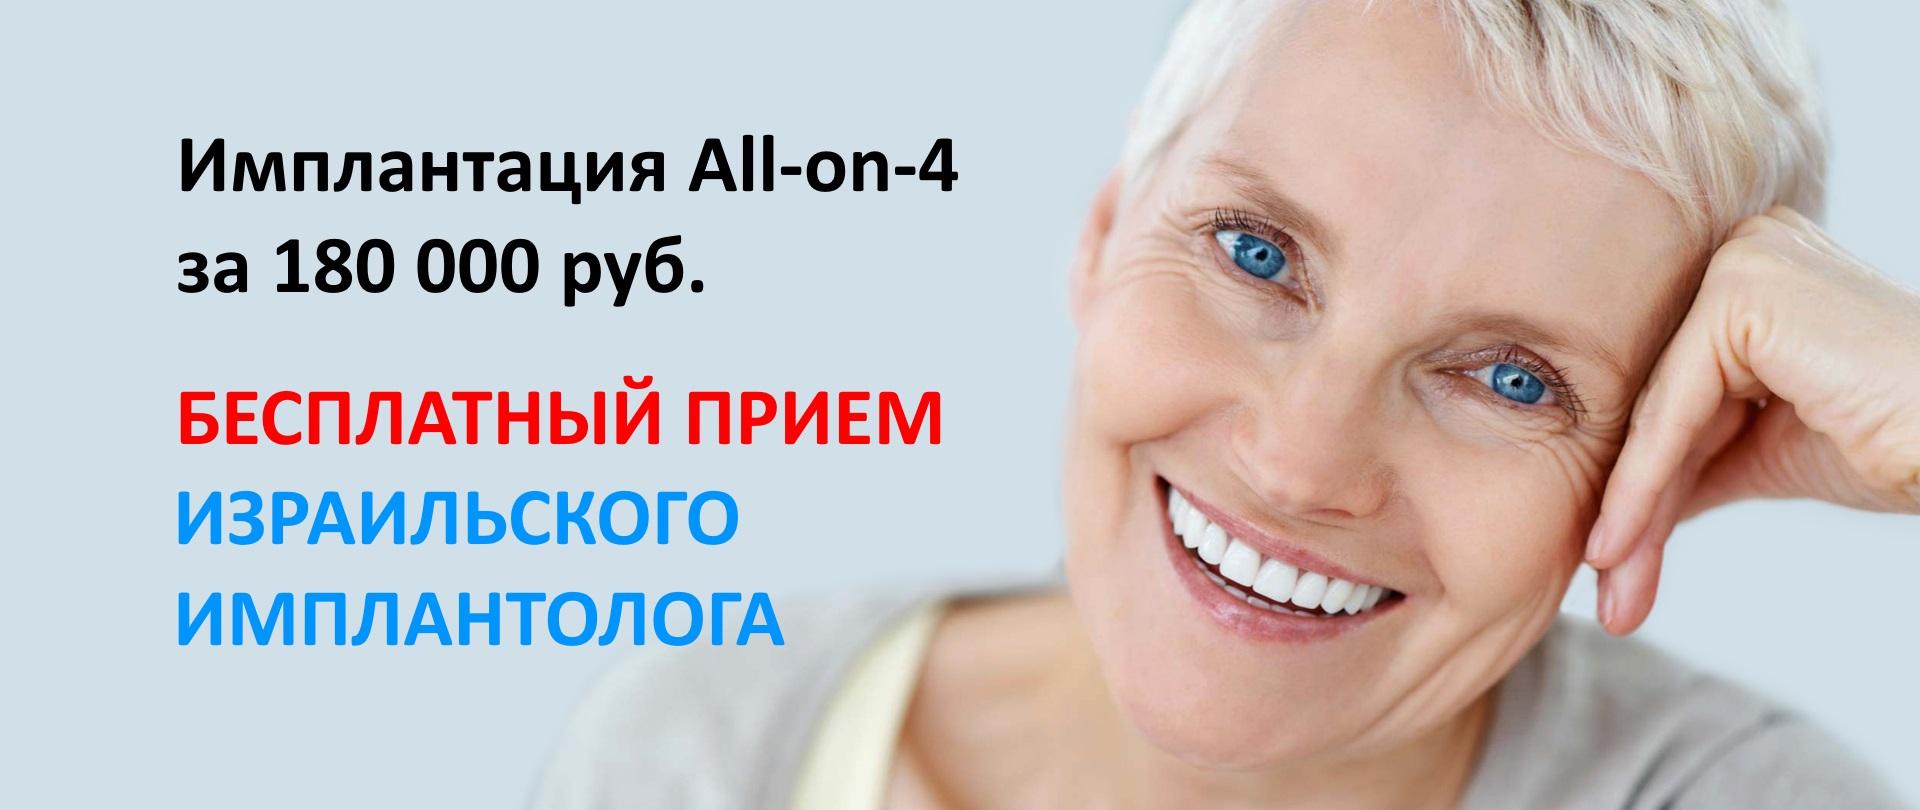 Имплантация челюсти All-on-4